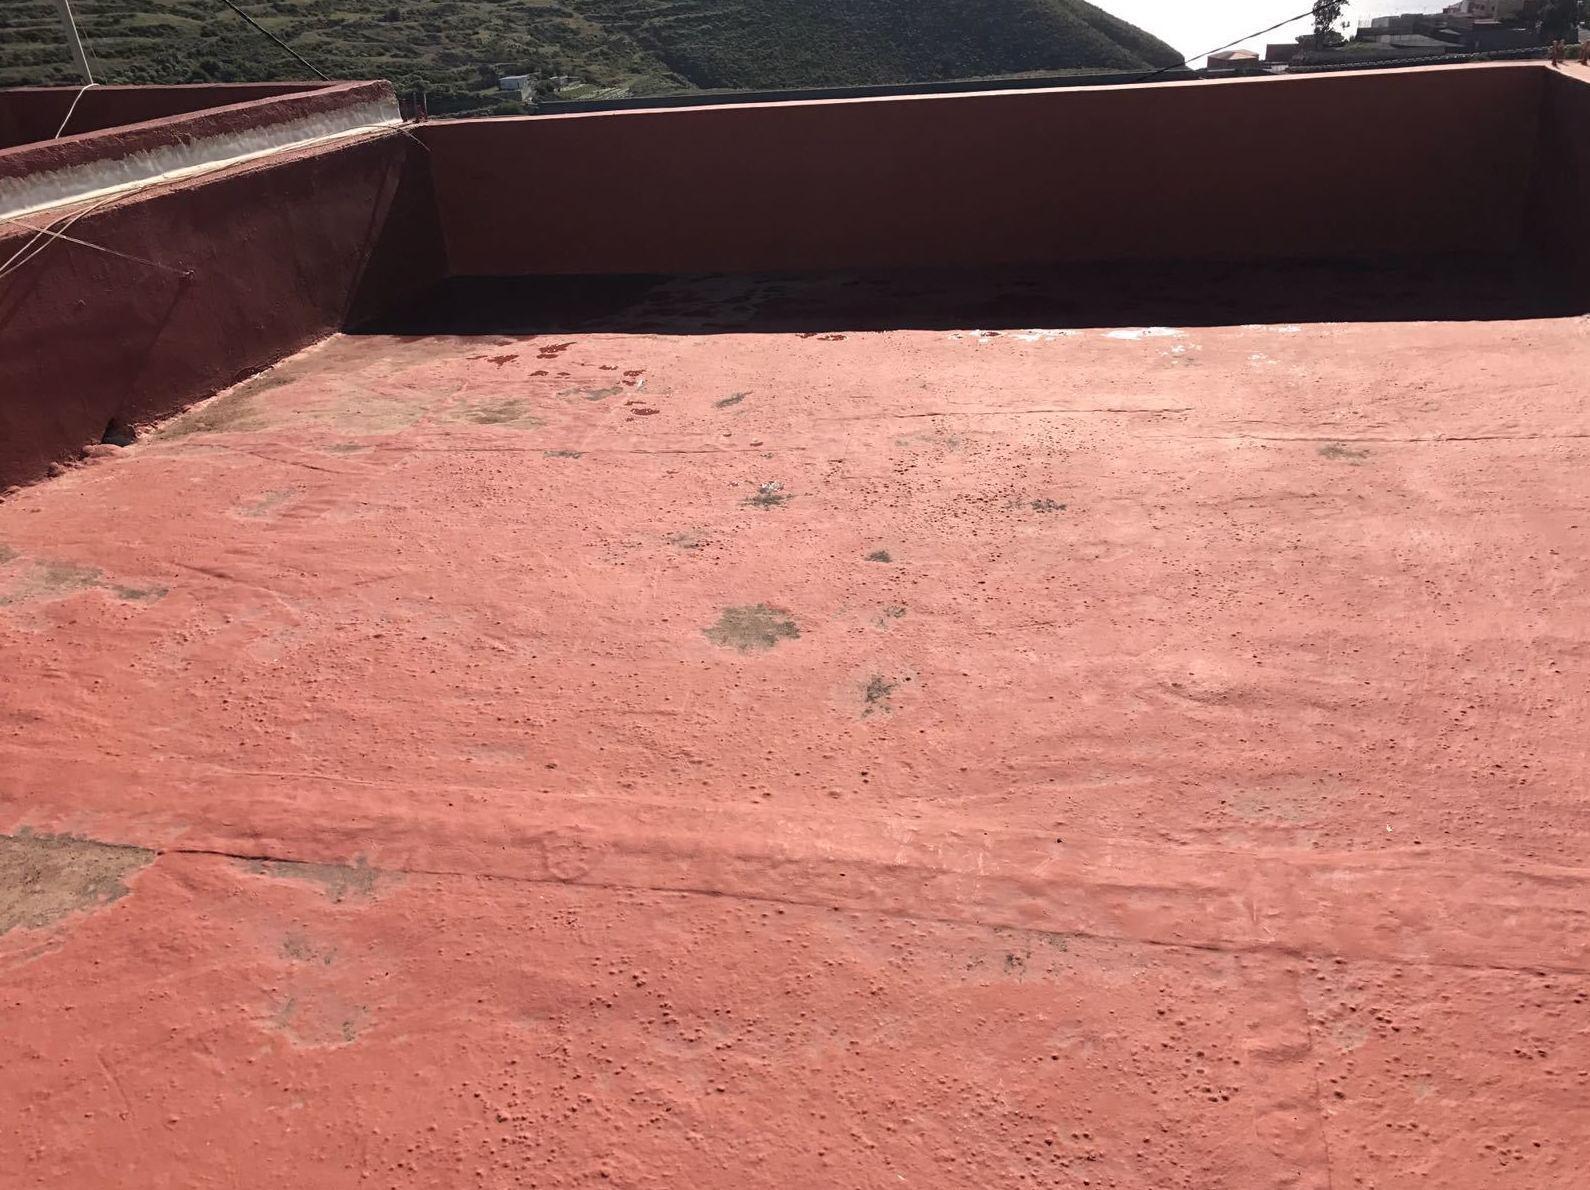 Foto 19 de Impermeabilizaciones en Santa Cruz de Tenerife | Ingarpe